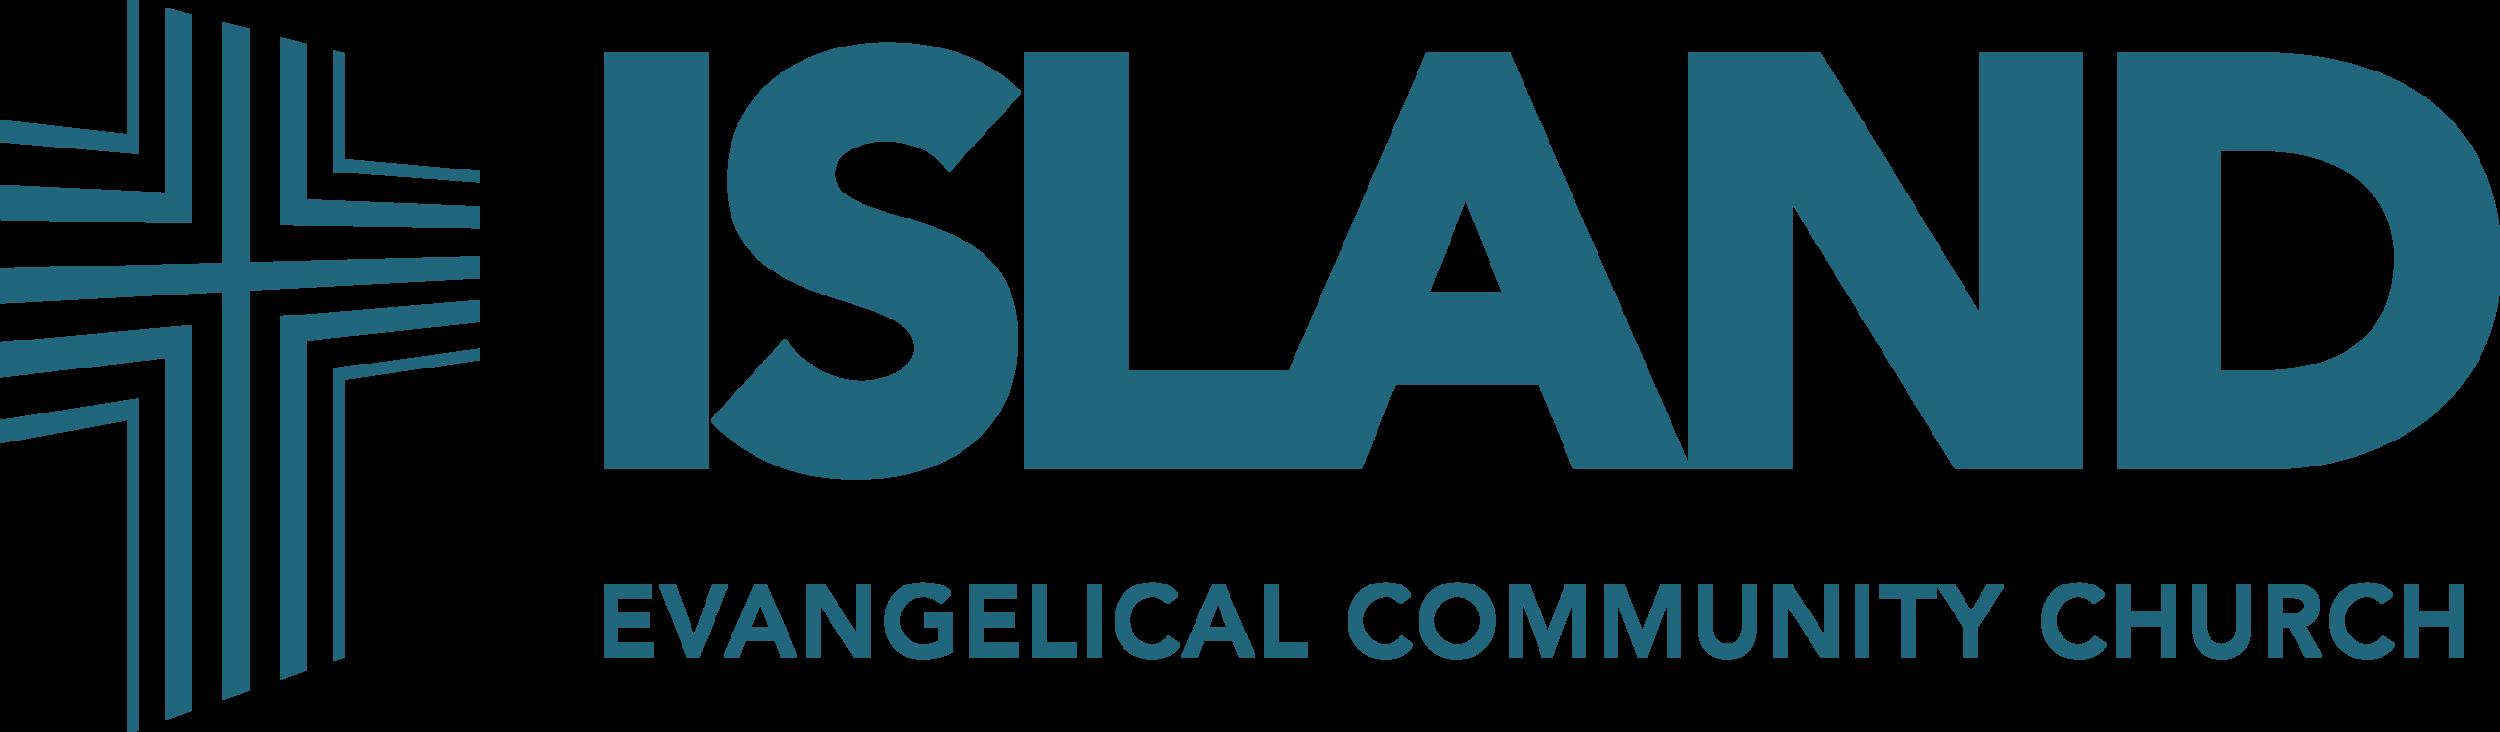 IECC-logo.png